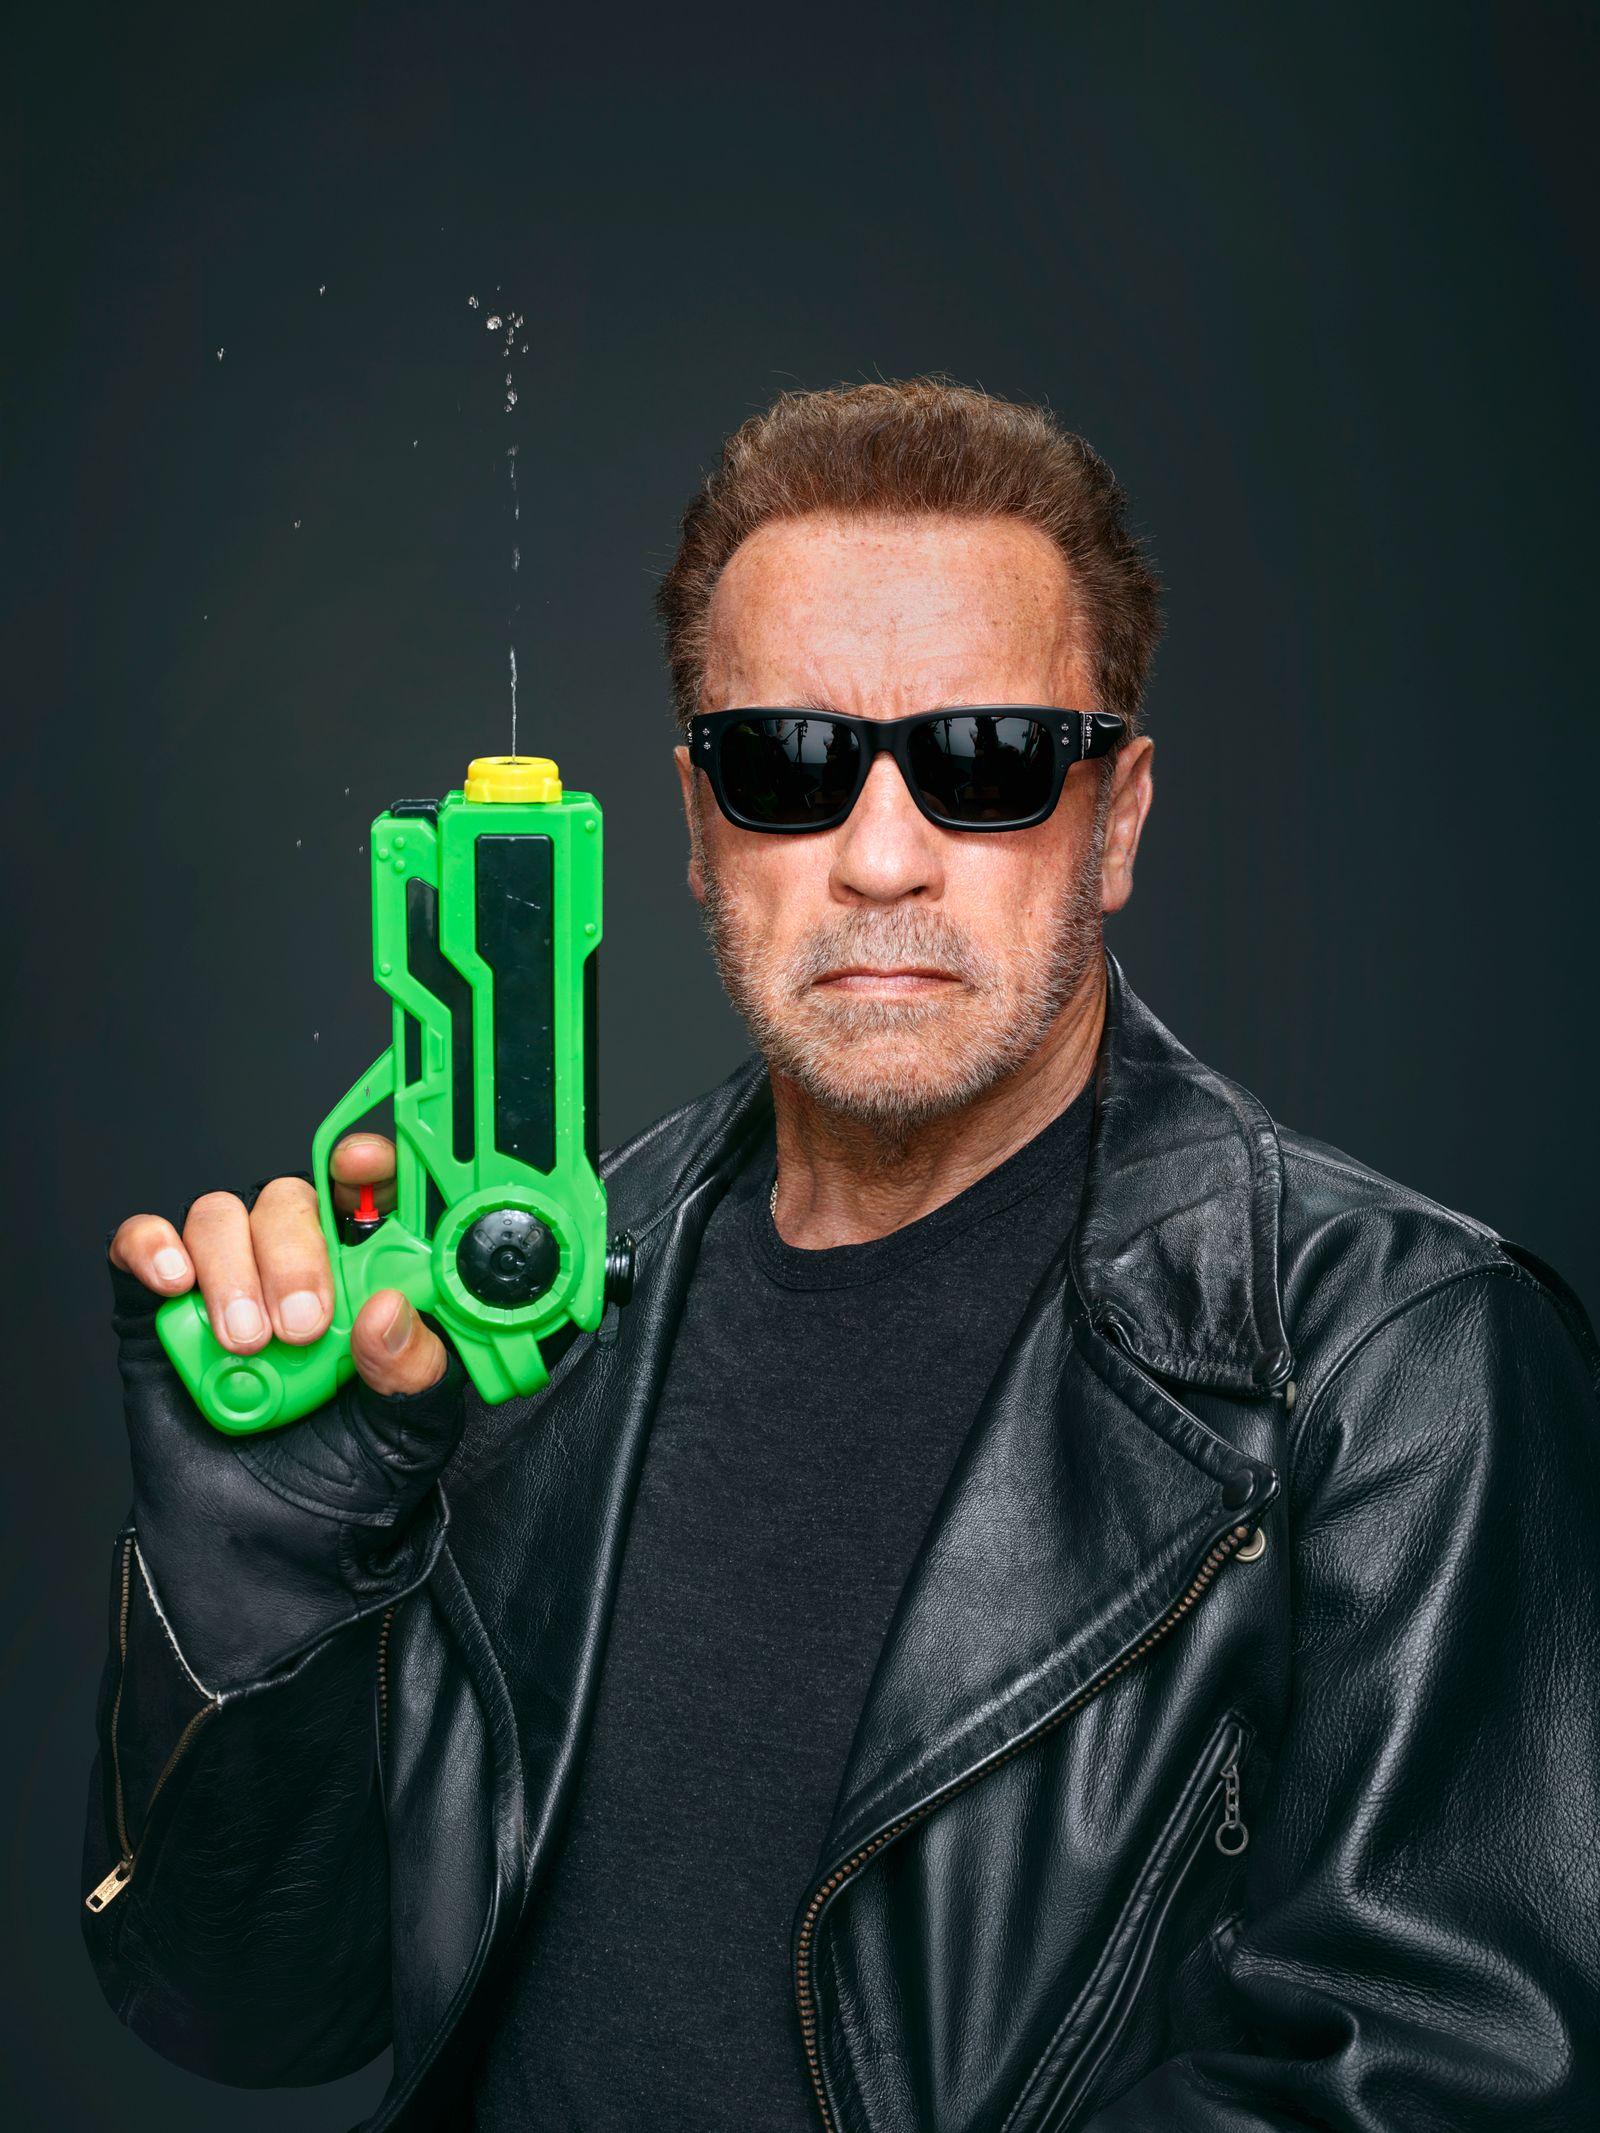 Schwarzenegger_Arnold_Spiegel_073021_00144_F